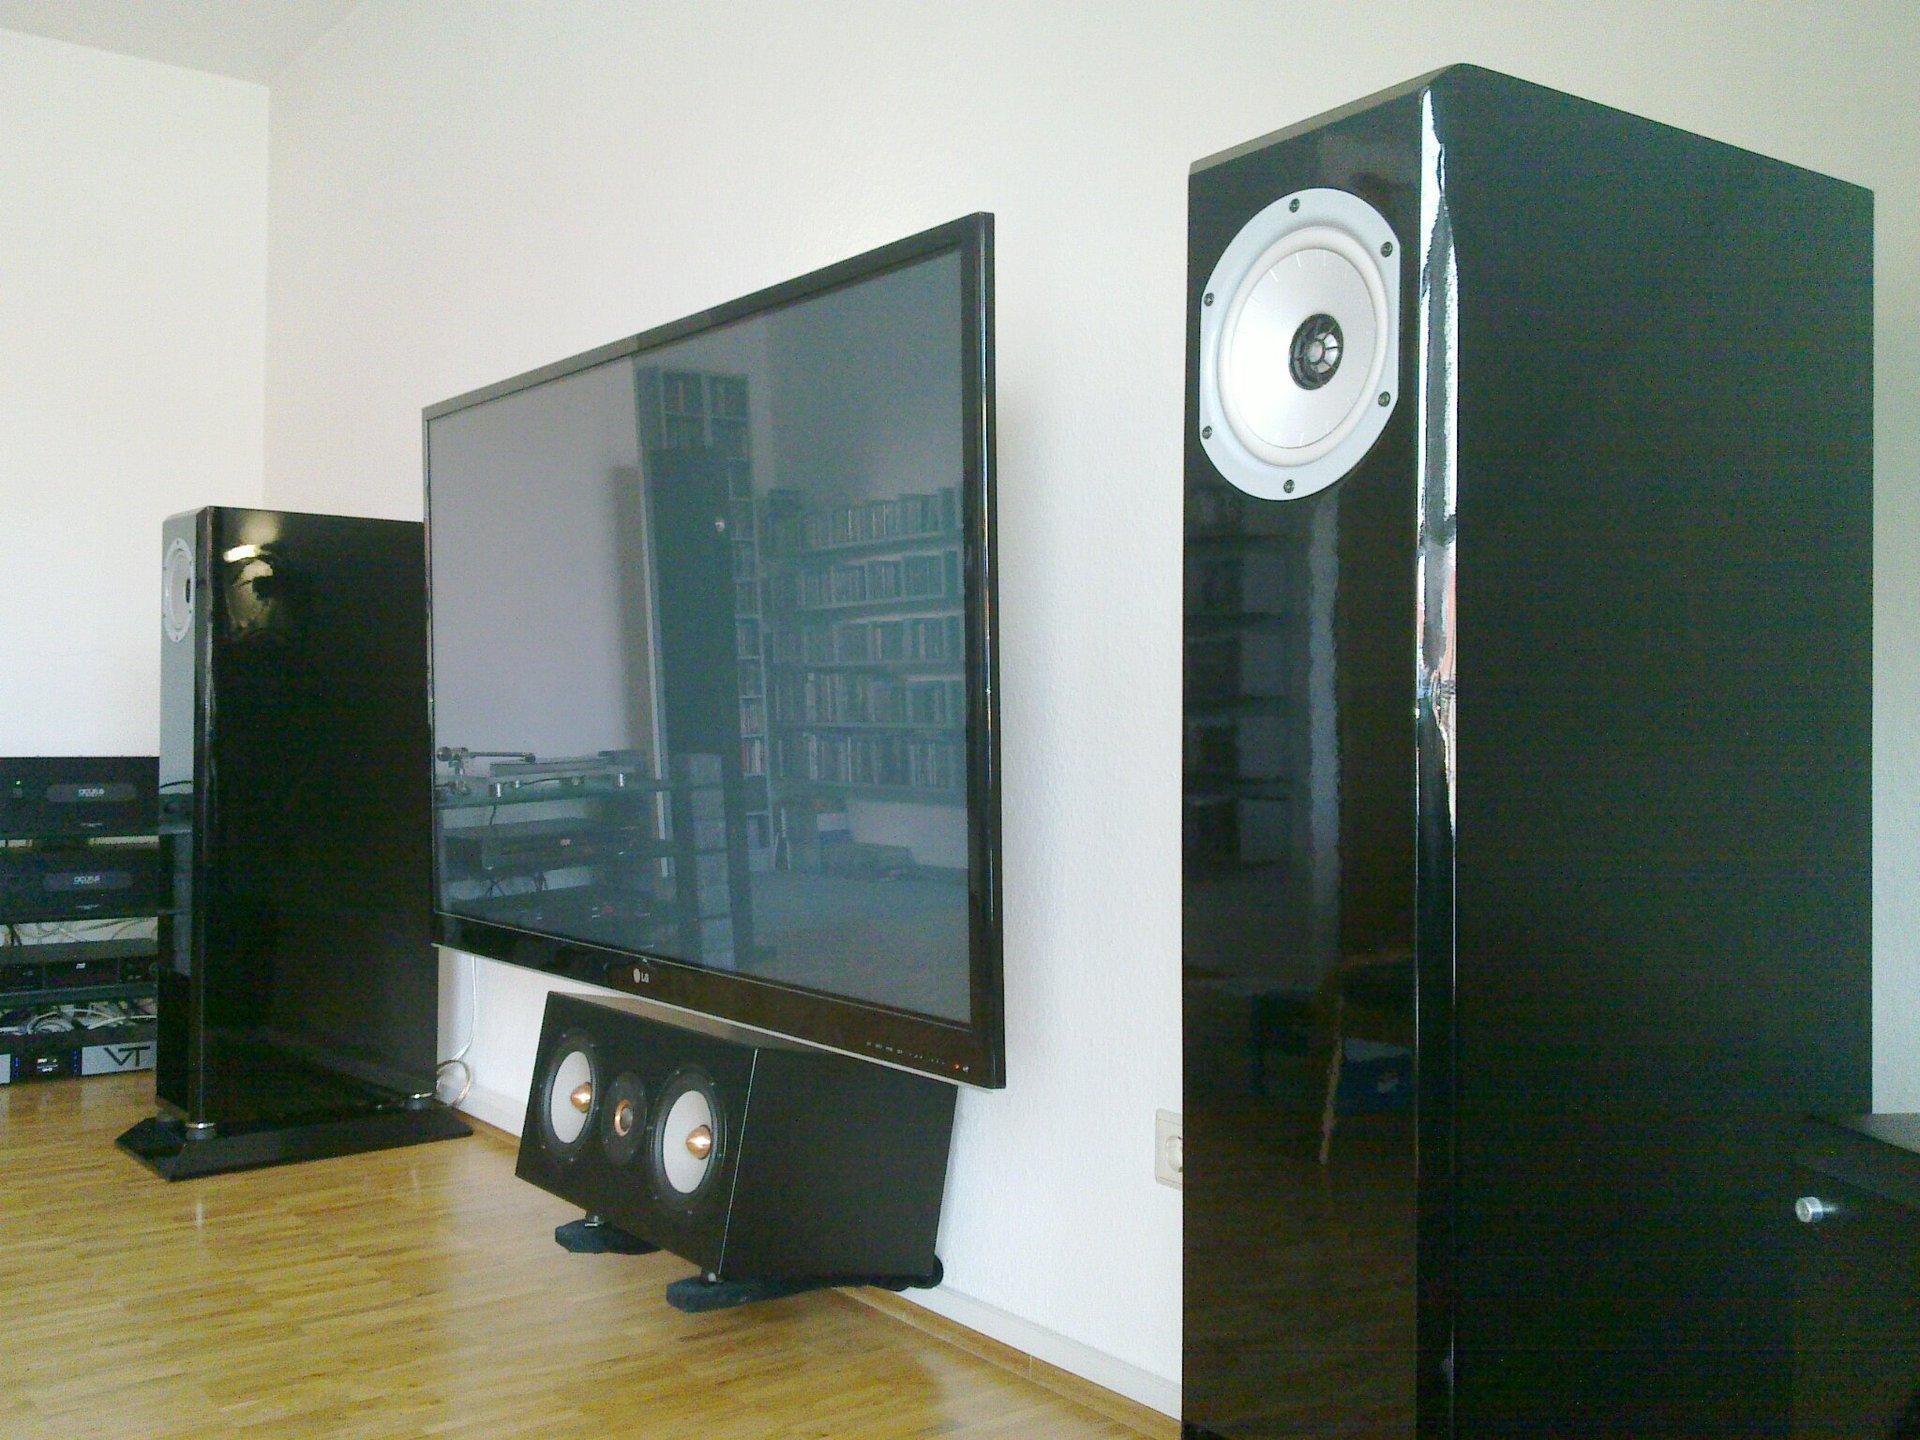 klavierlack selber machen g nstig auto polieren lassen. Black Bedroom Furniture Sets. Home Design Ideas